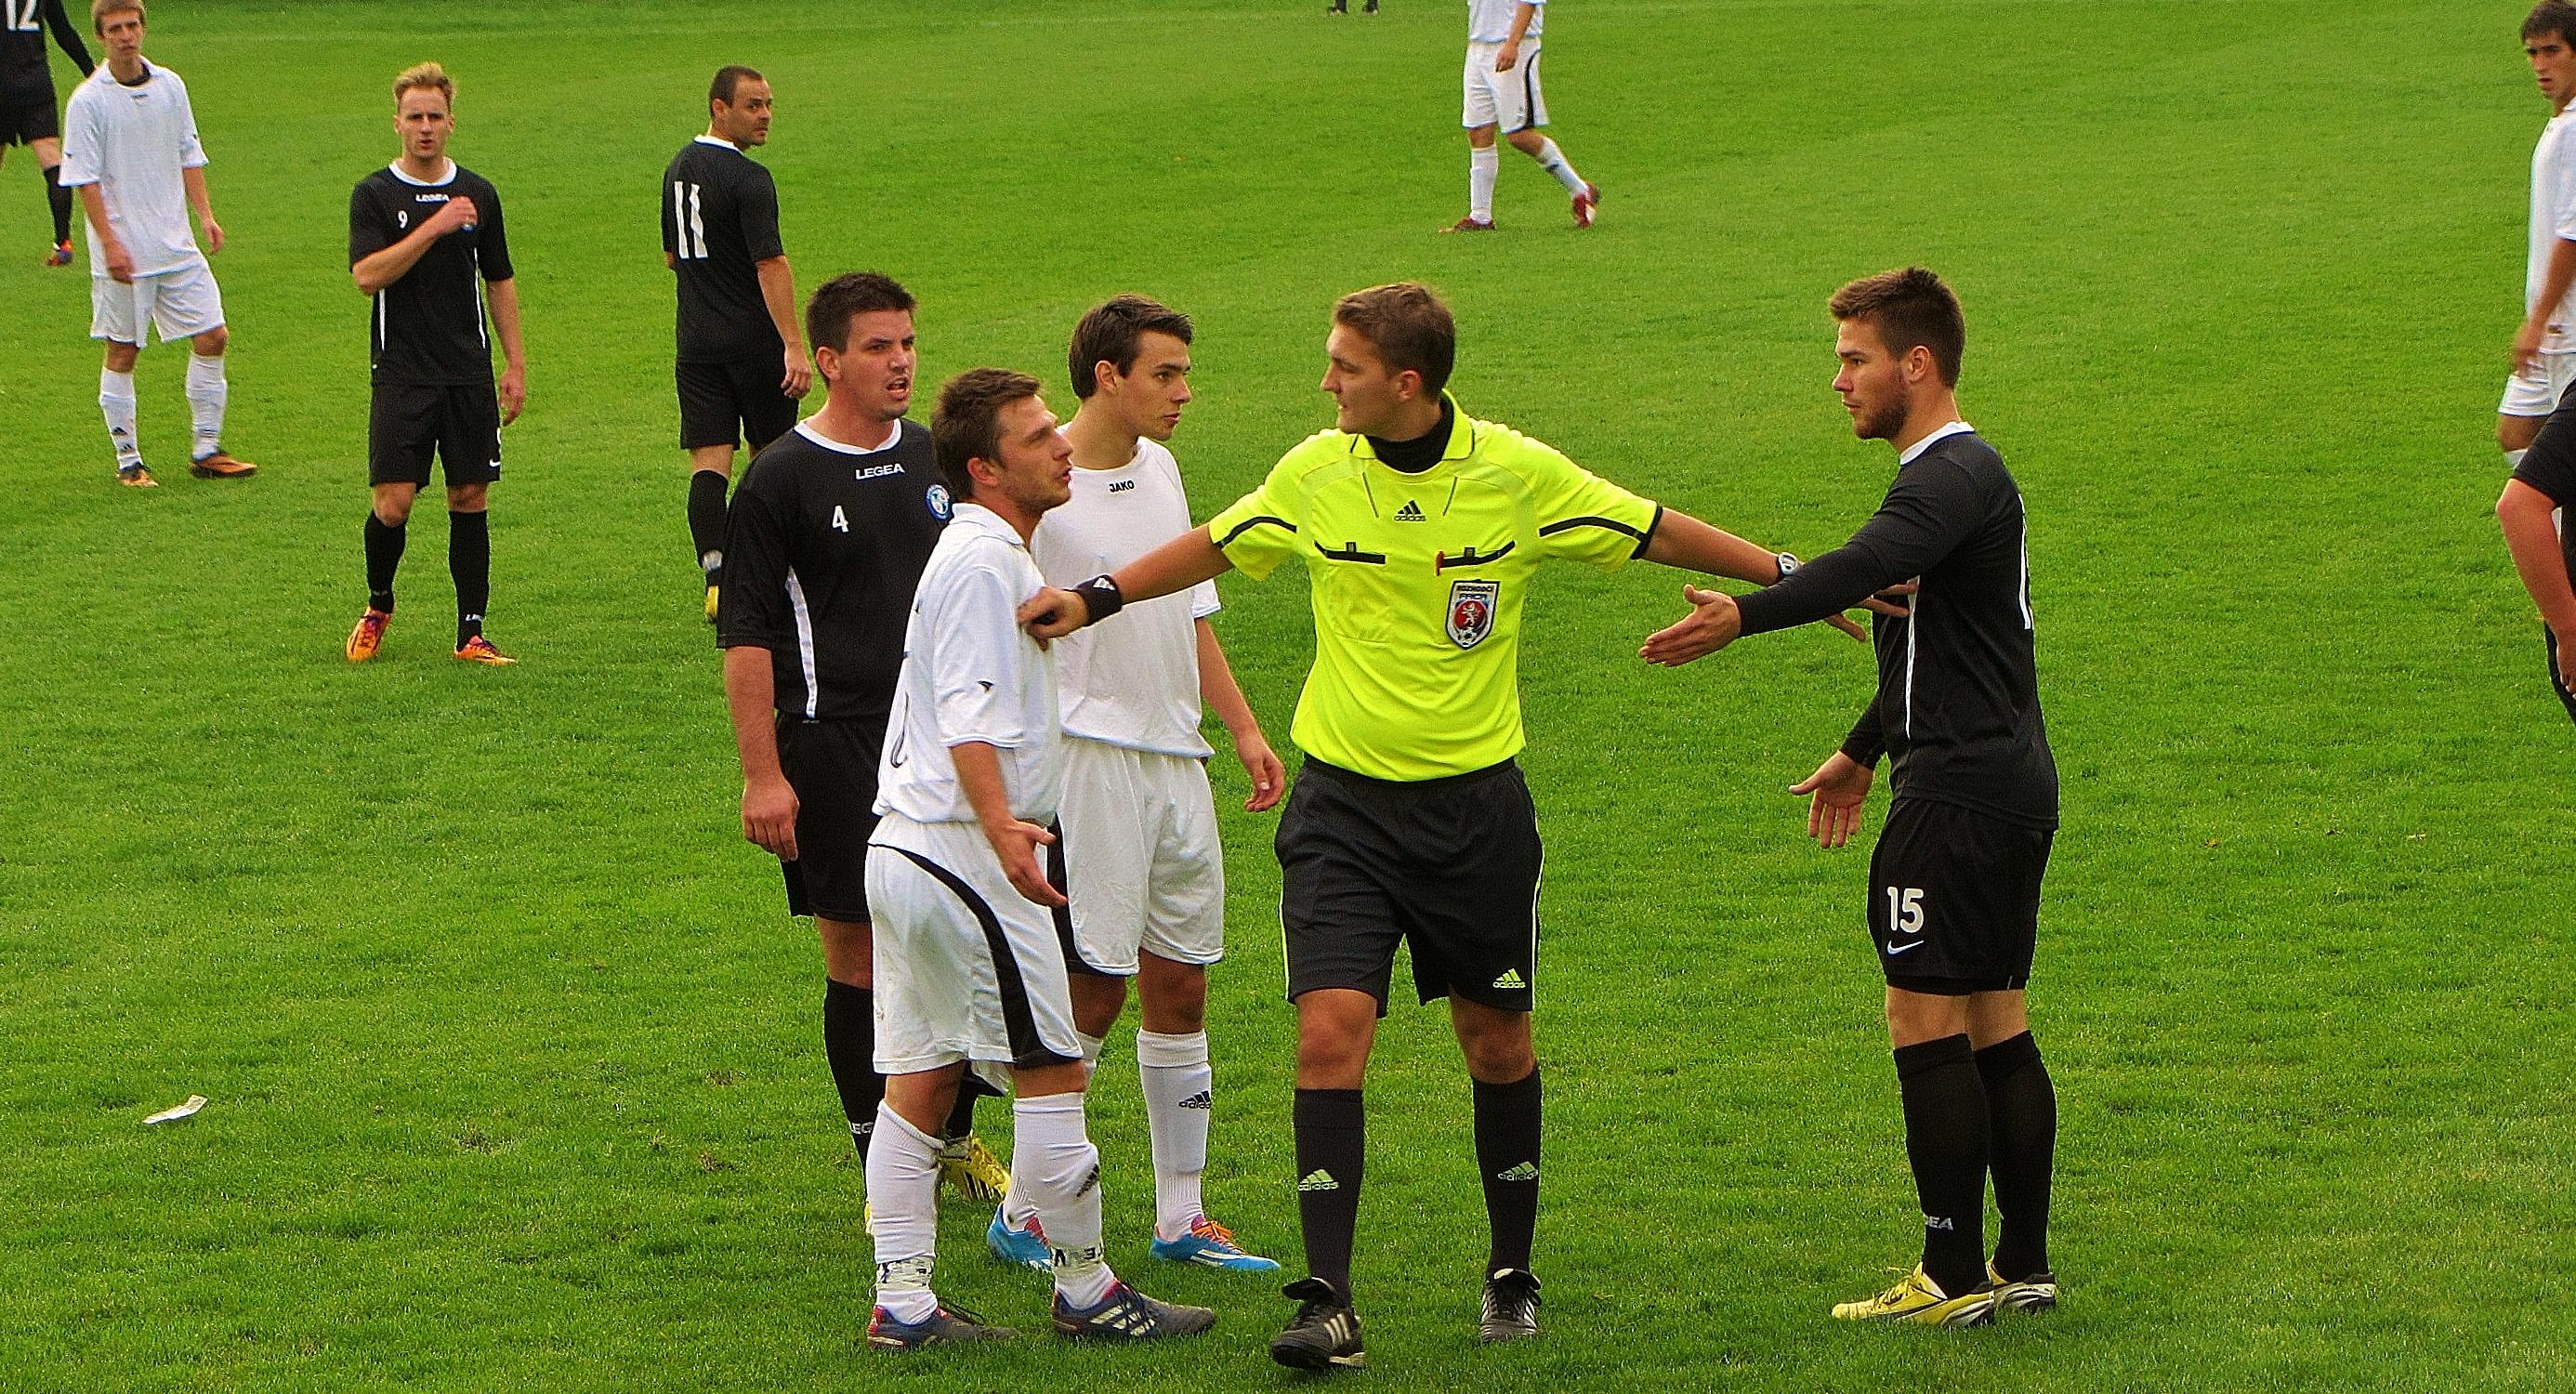 FK Troubky - Sokol Čechovice 2:2 (0:1)